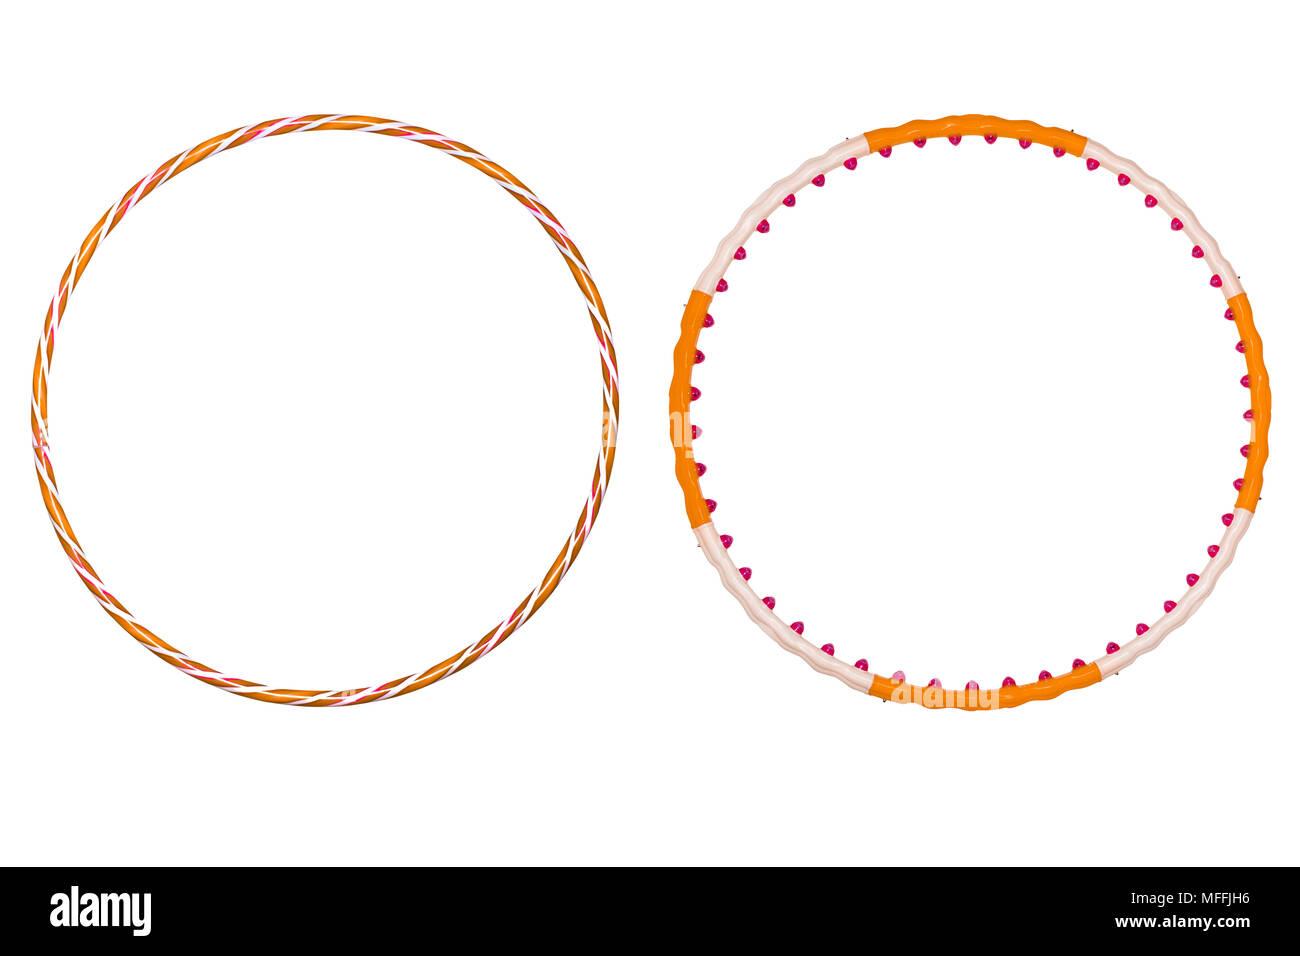 The hula Hoop isolated on white background - Stock Image